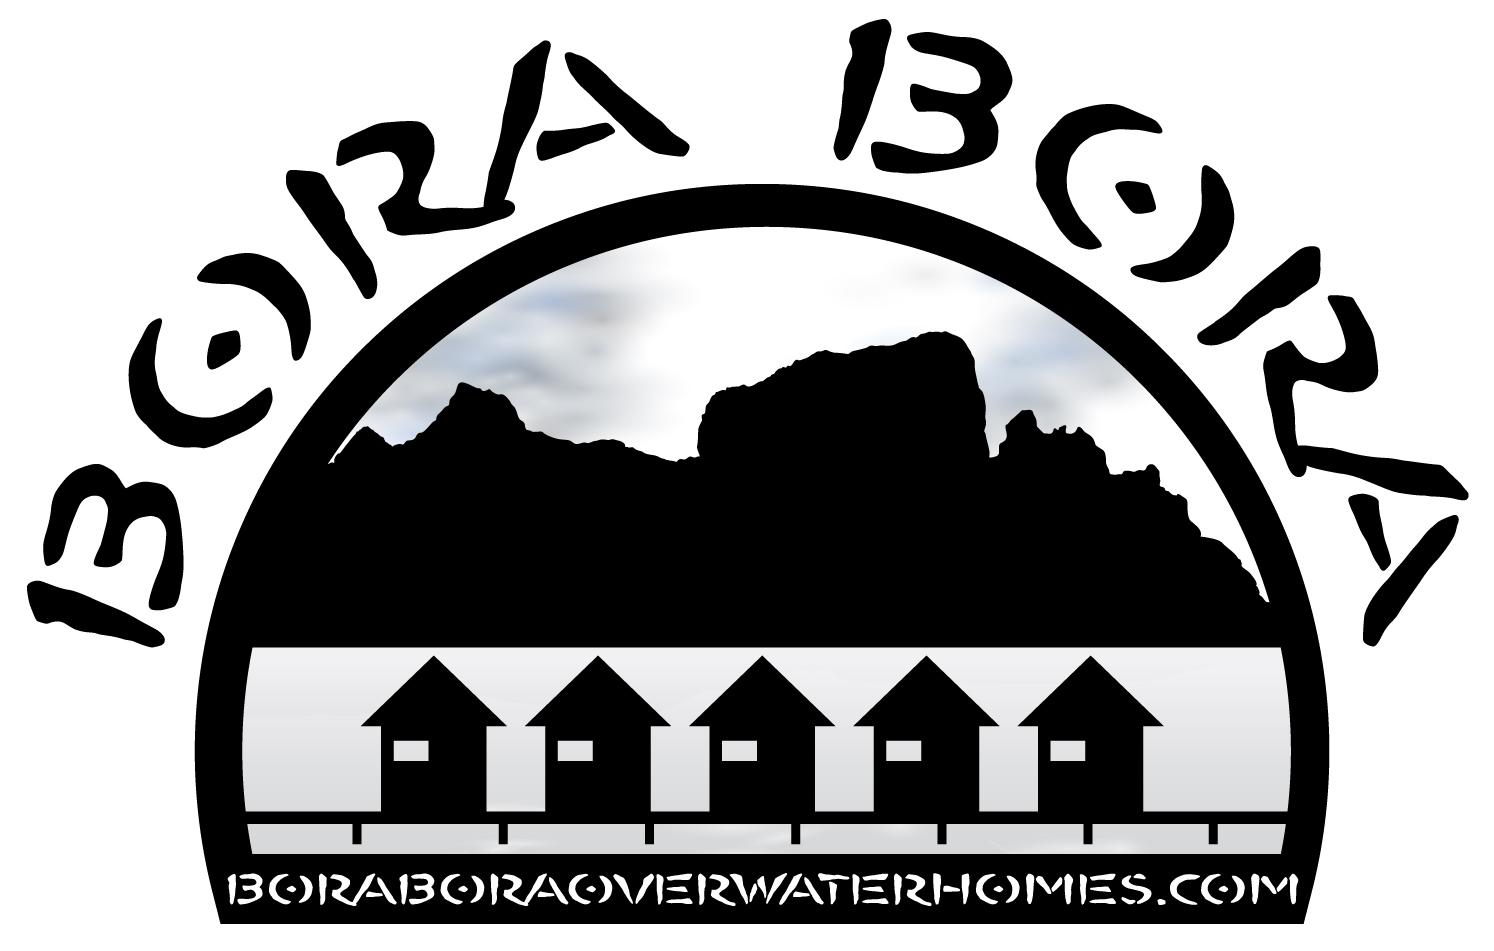 Bora Bora Over Water Luxury Vacation Homes.